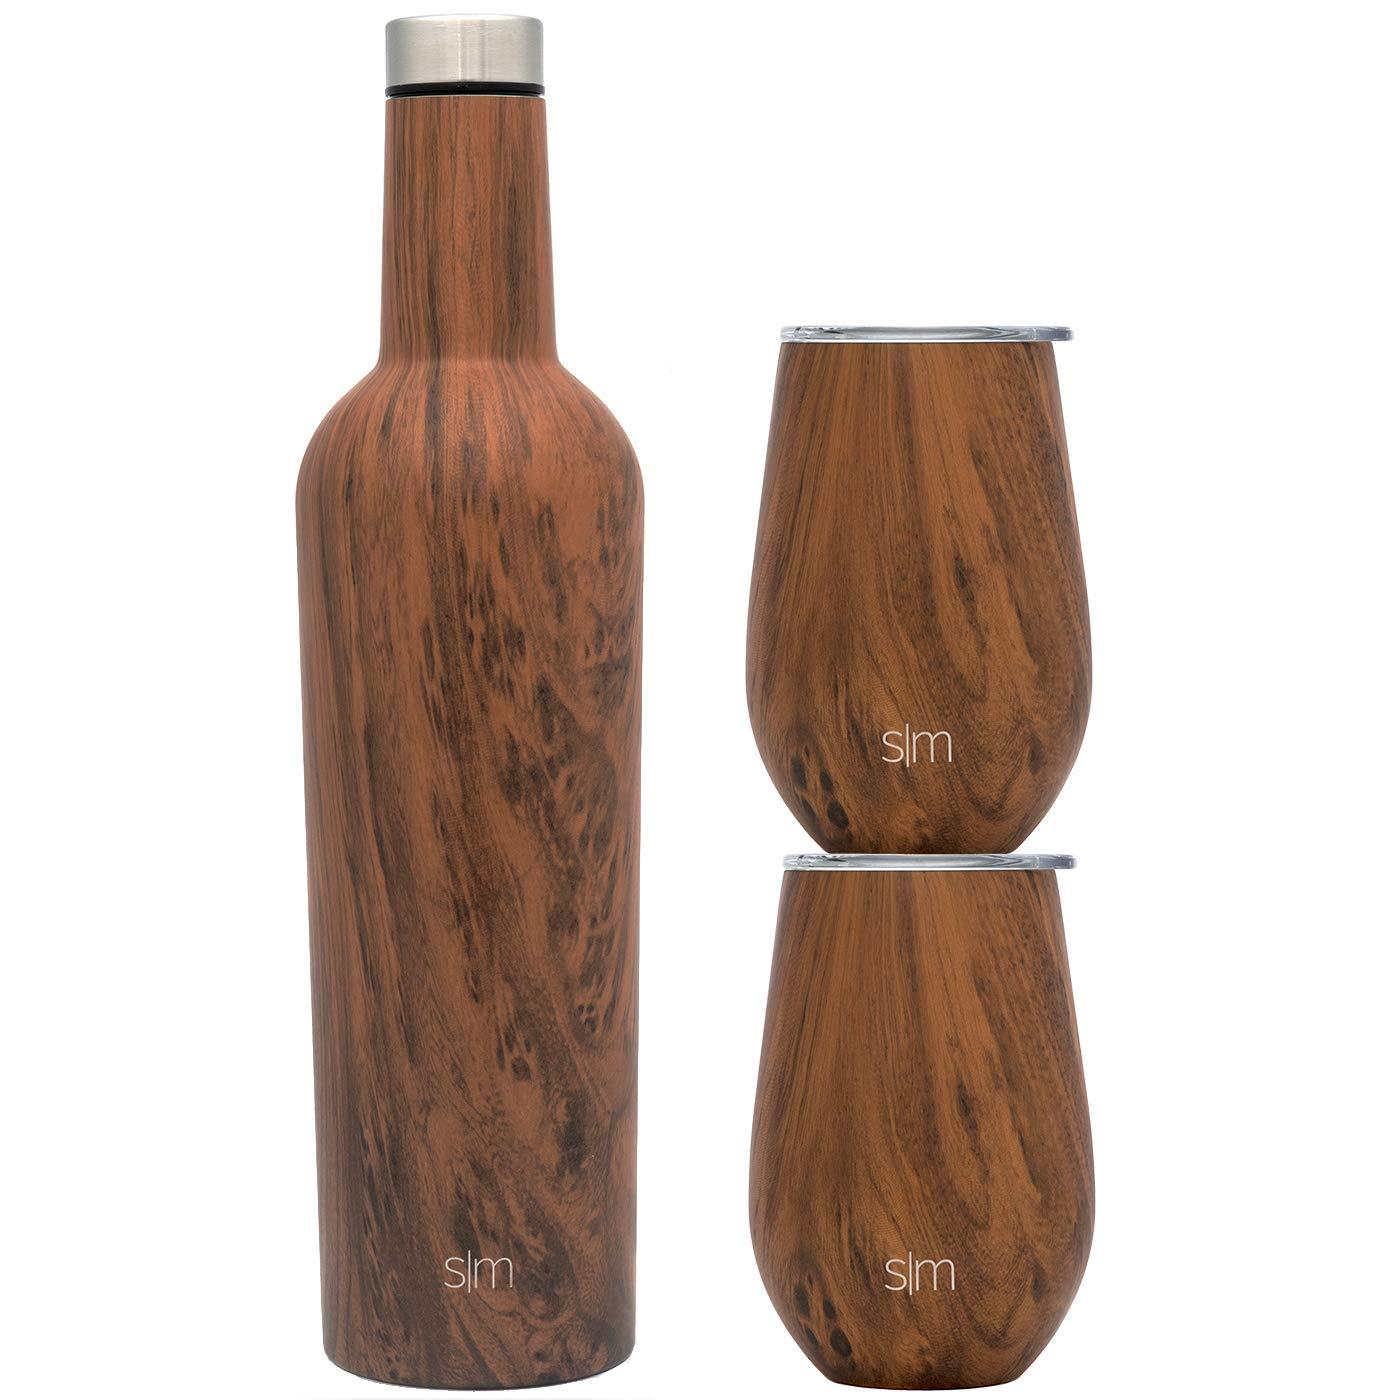 Simple Modern Spirit Wine Bundle - 2 12oz Wine Tumbler Glasses with Lids & 1 Wine Bottle - Vacuum Insulated 18/8 Stainless Steel Pattern: Wood Grain by Simple Modern